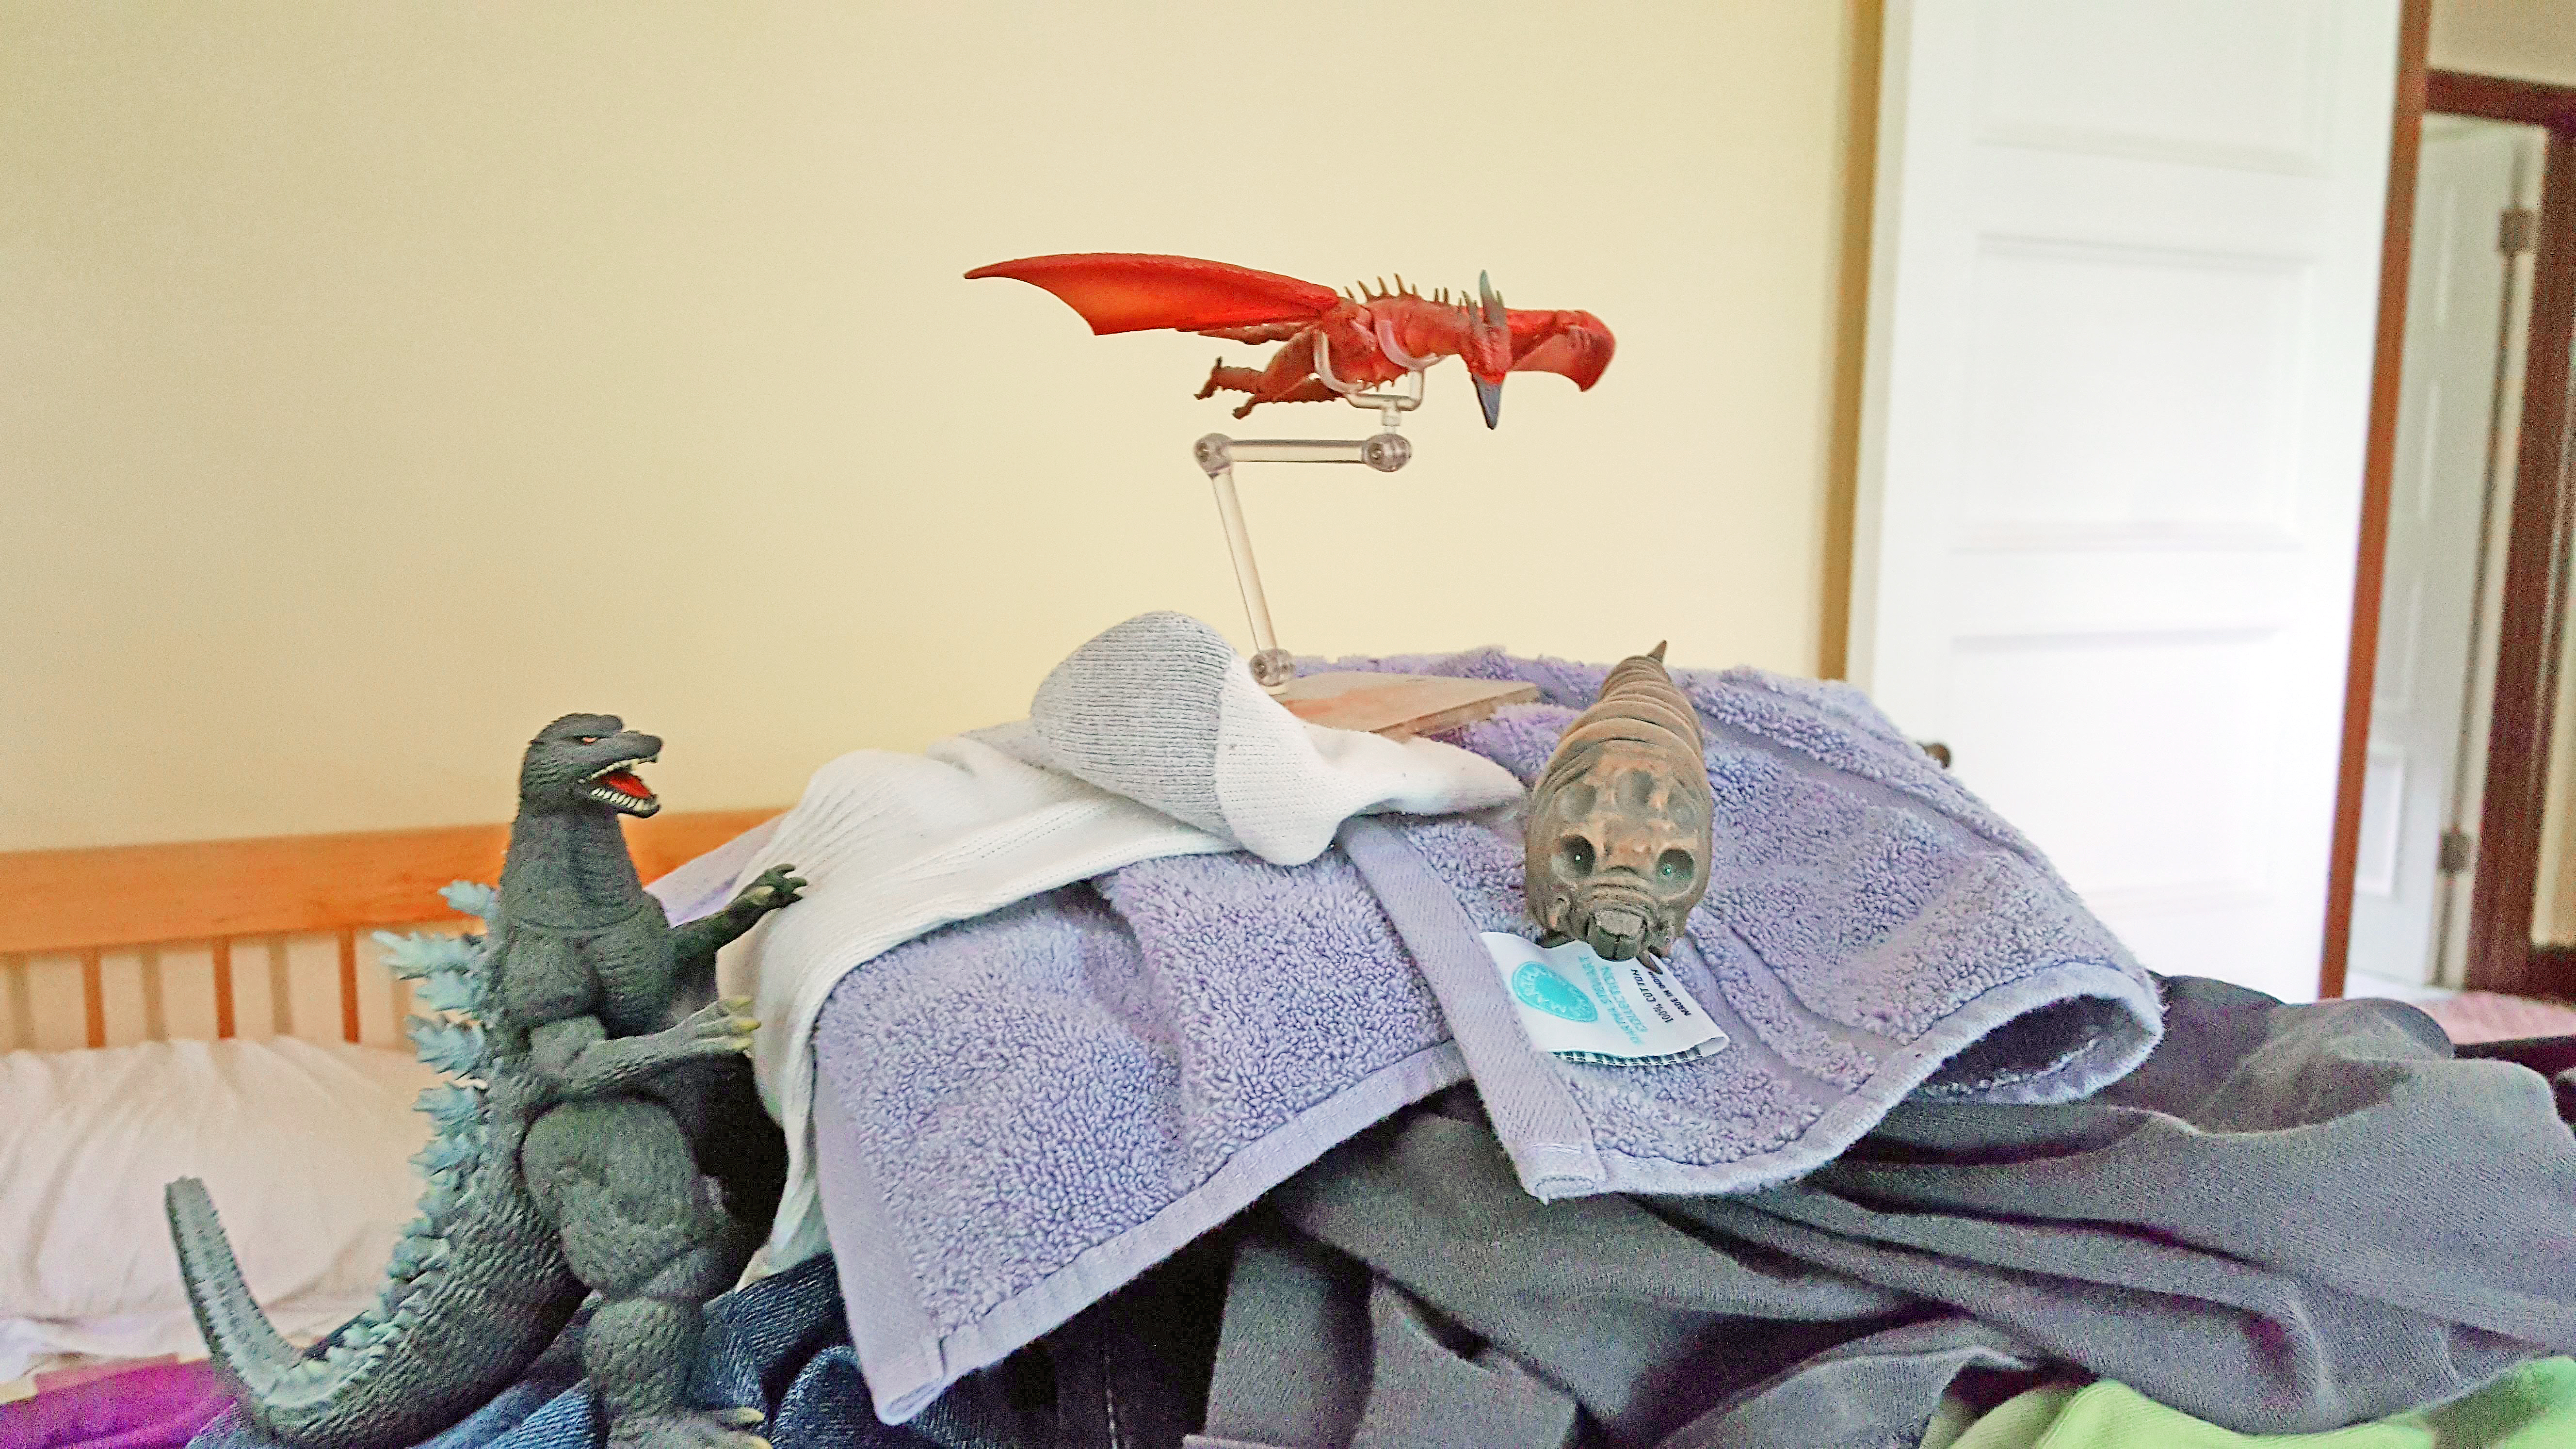 three atop the mount - Godzilla on Mount Laundry